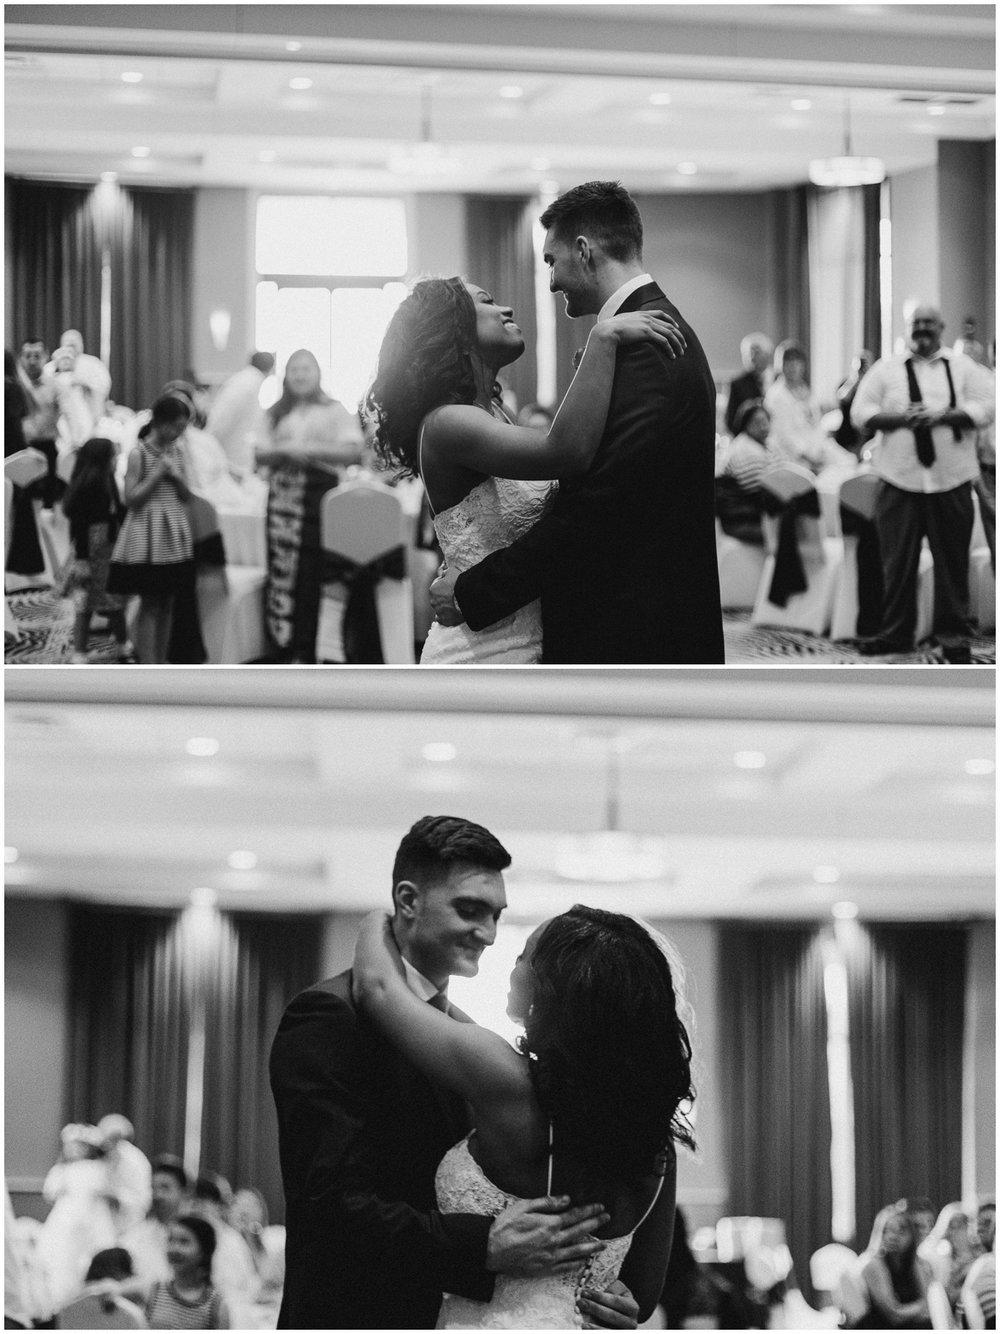 shipley_memphis_wedding_photographer_71.jpg